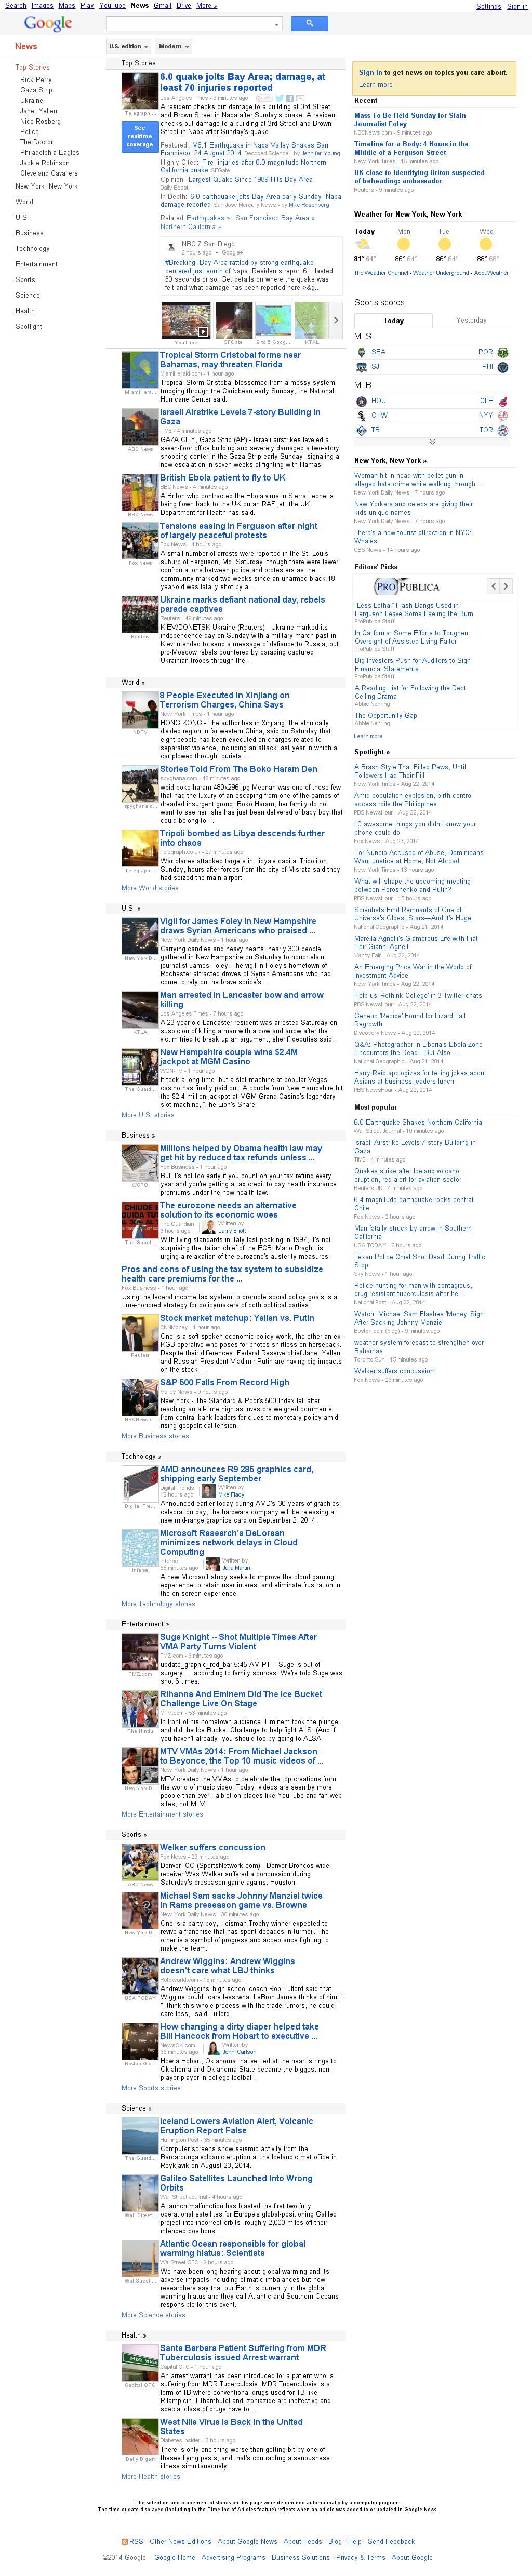 Google News at Sunday Aug. 24, 2014, 2:07 p.m. UTC